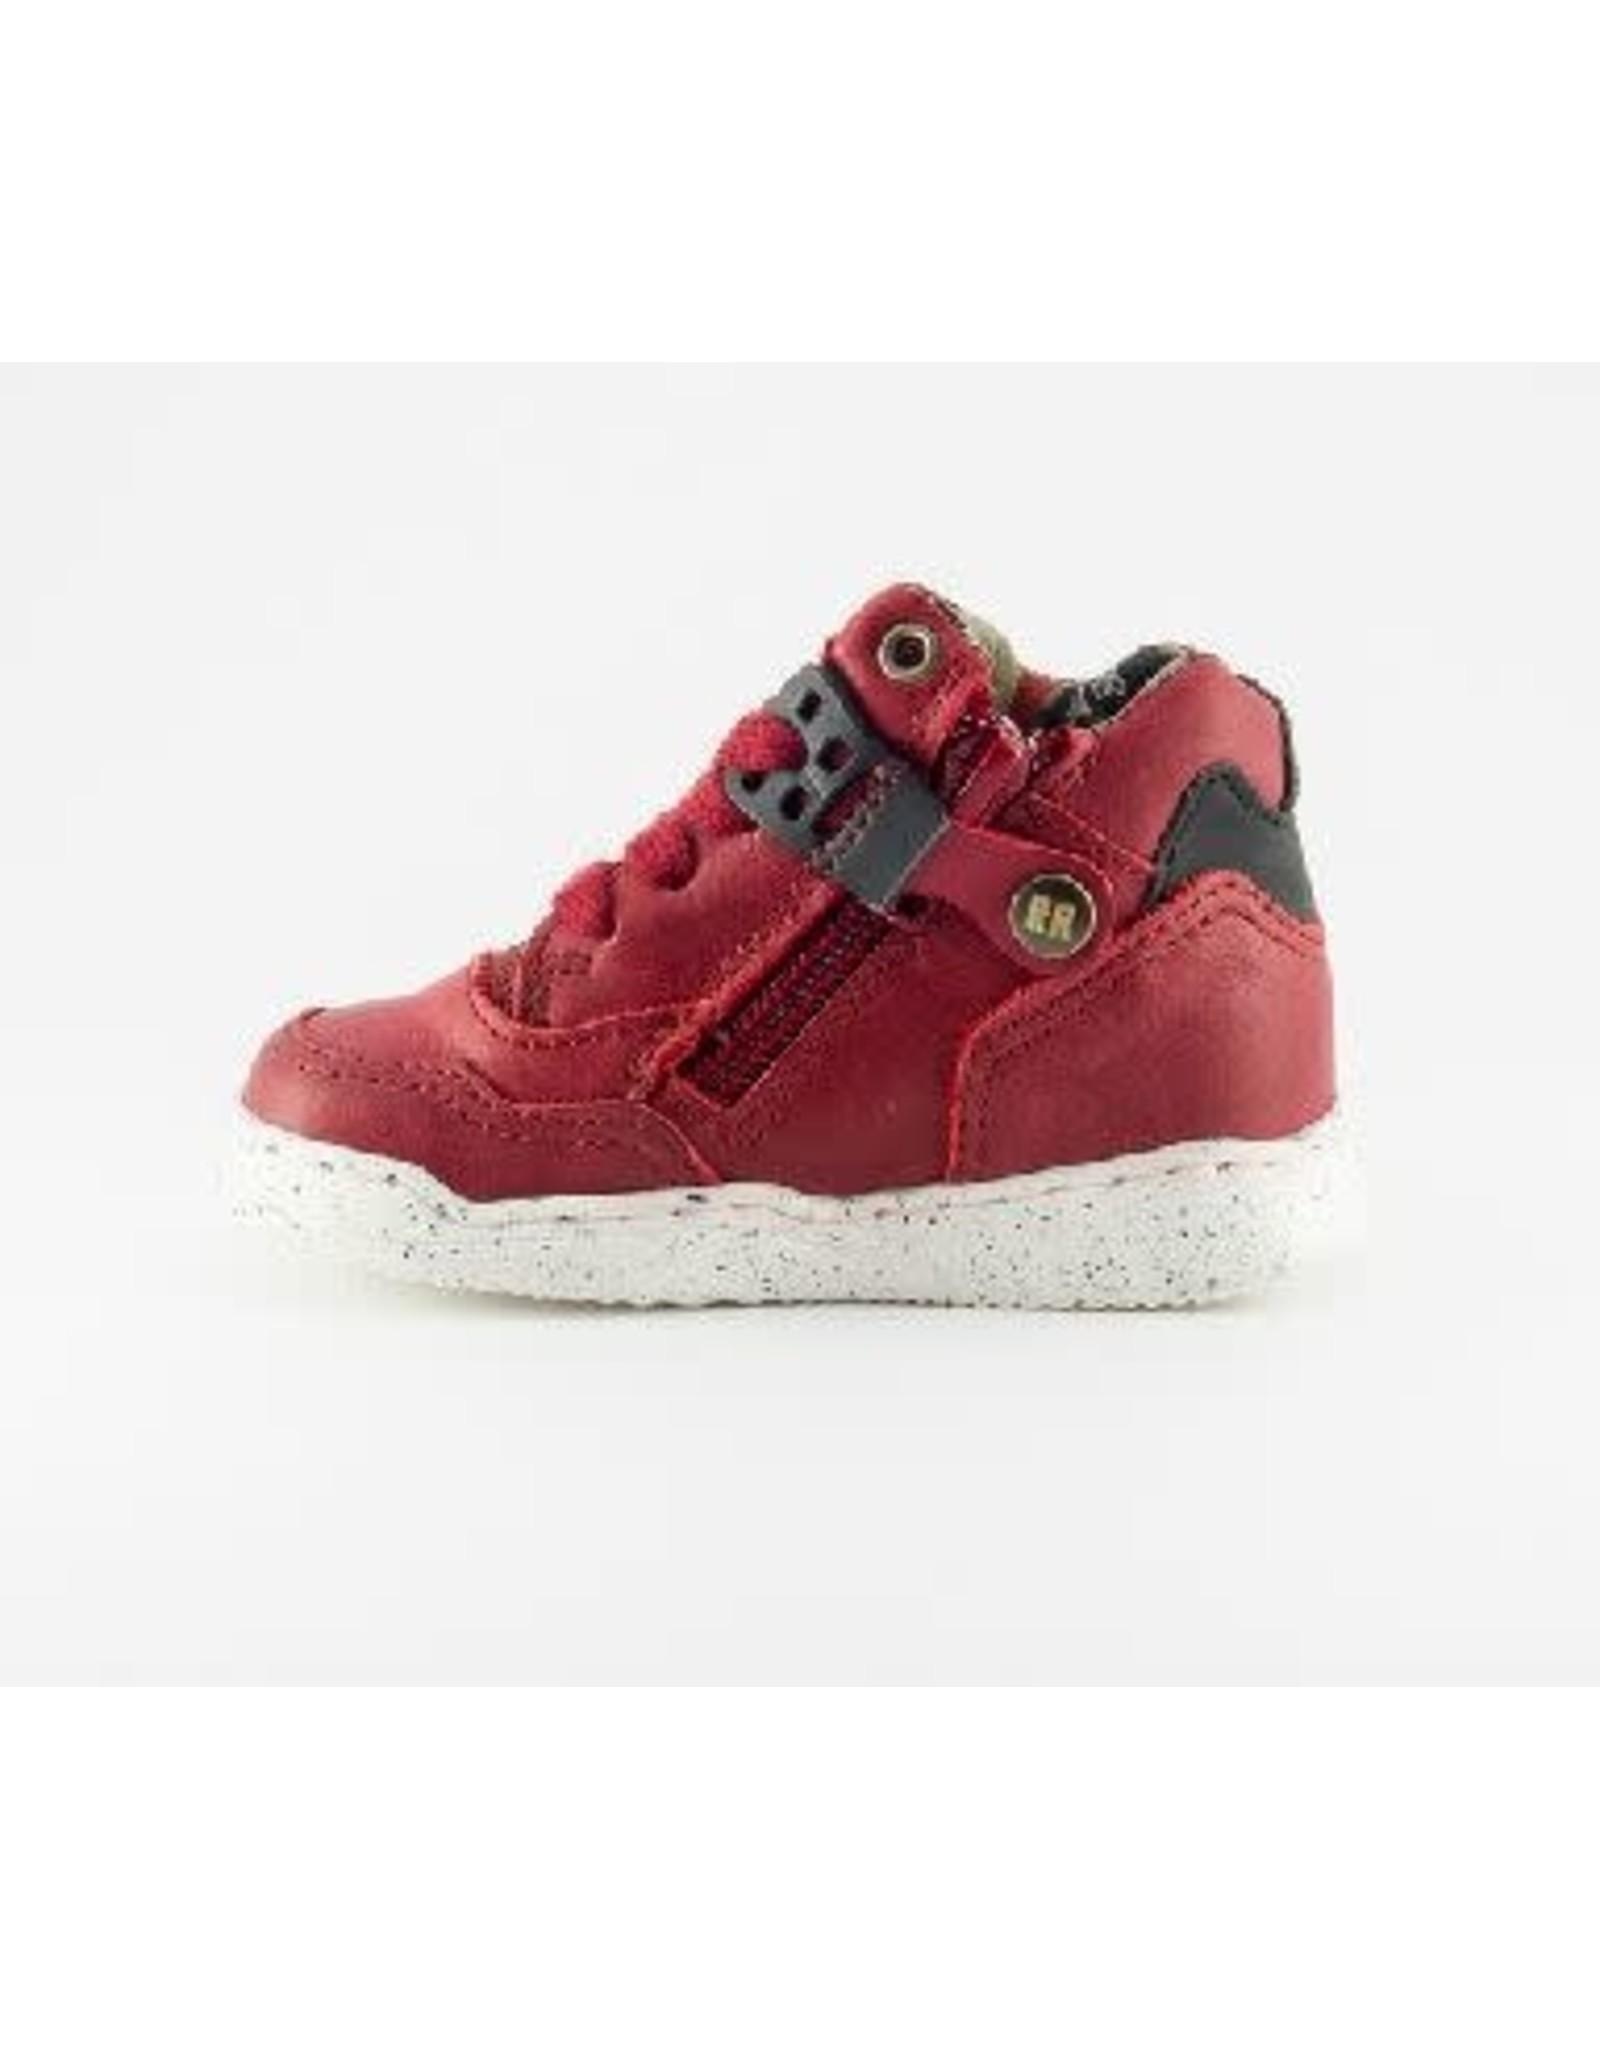 RedRag sneaker red waxed